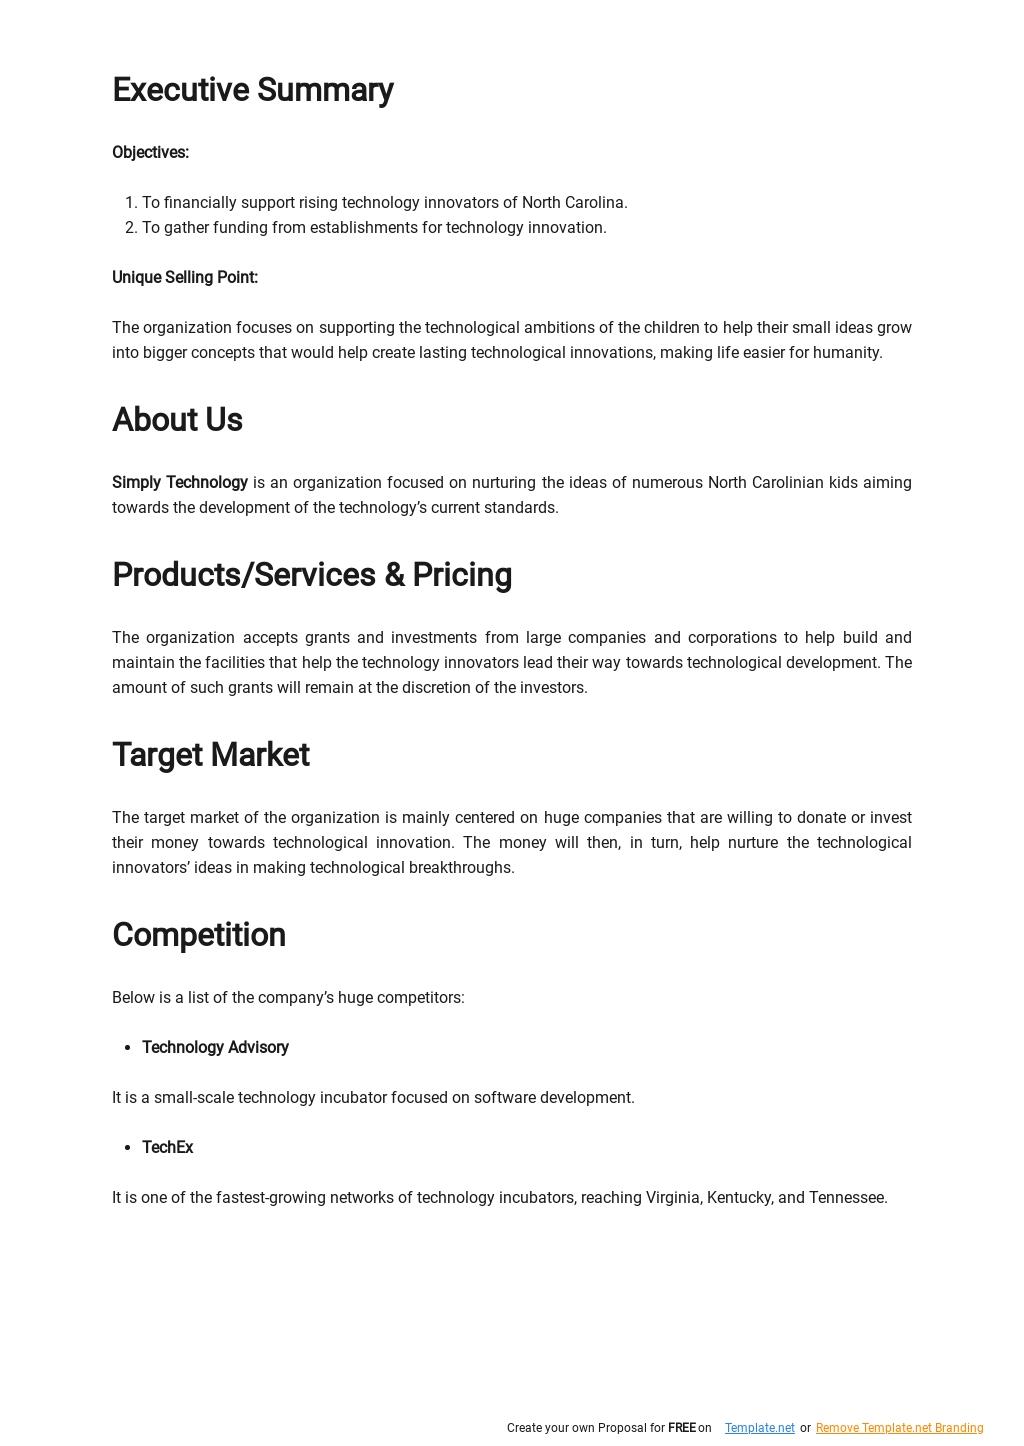 Technology Incubator Business Plan Template 1.jpe